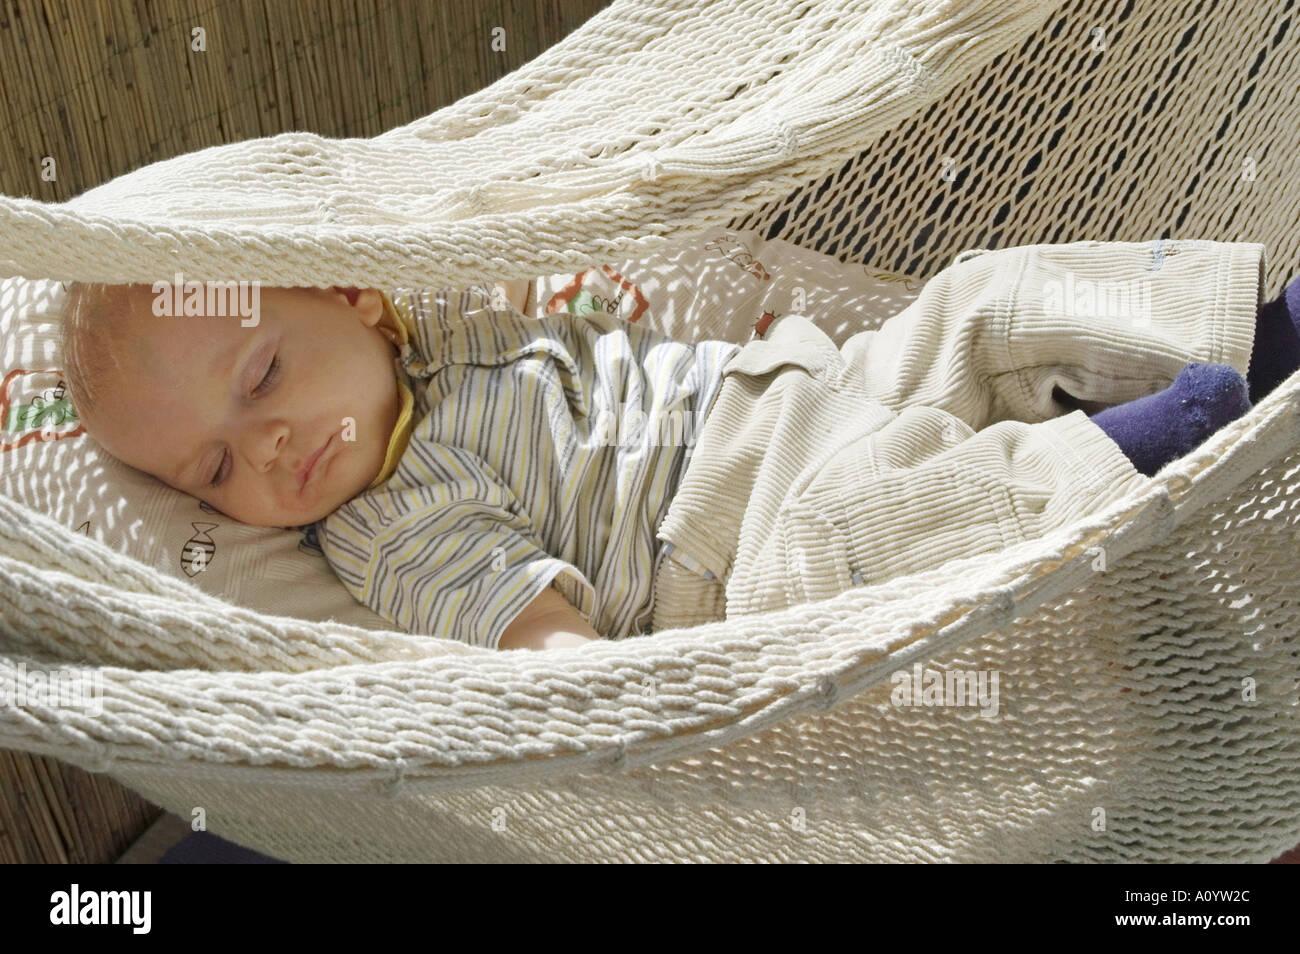 baby sleeping quietly in hammock baby sleeping quietly in hammock stock photo royalty free image      rh   alamy